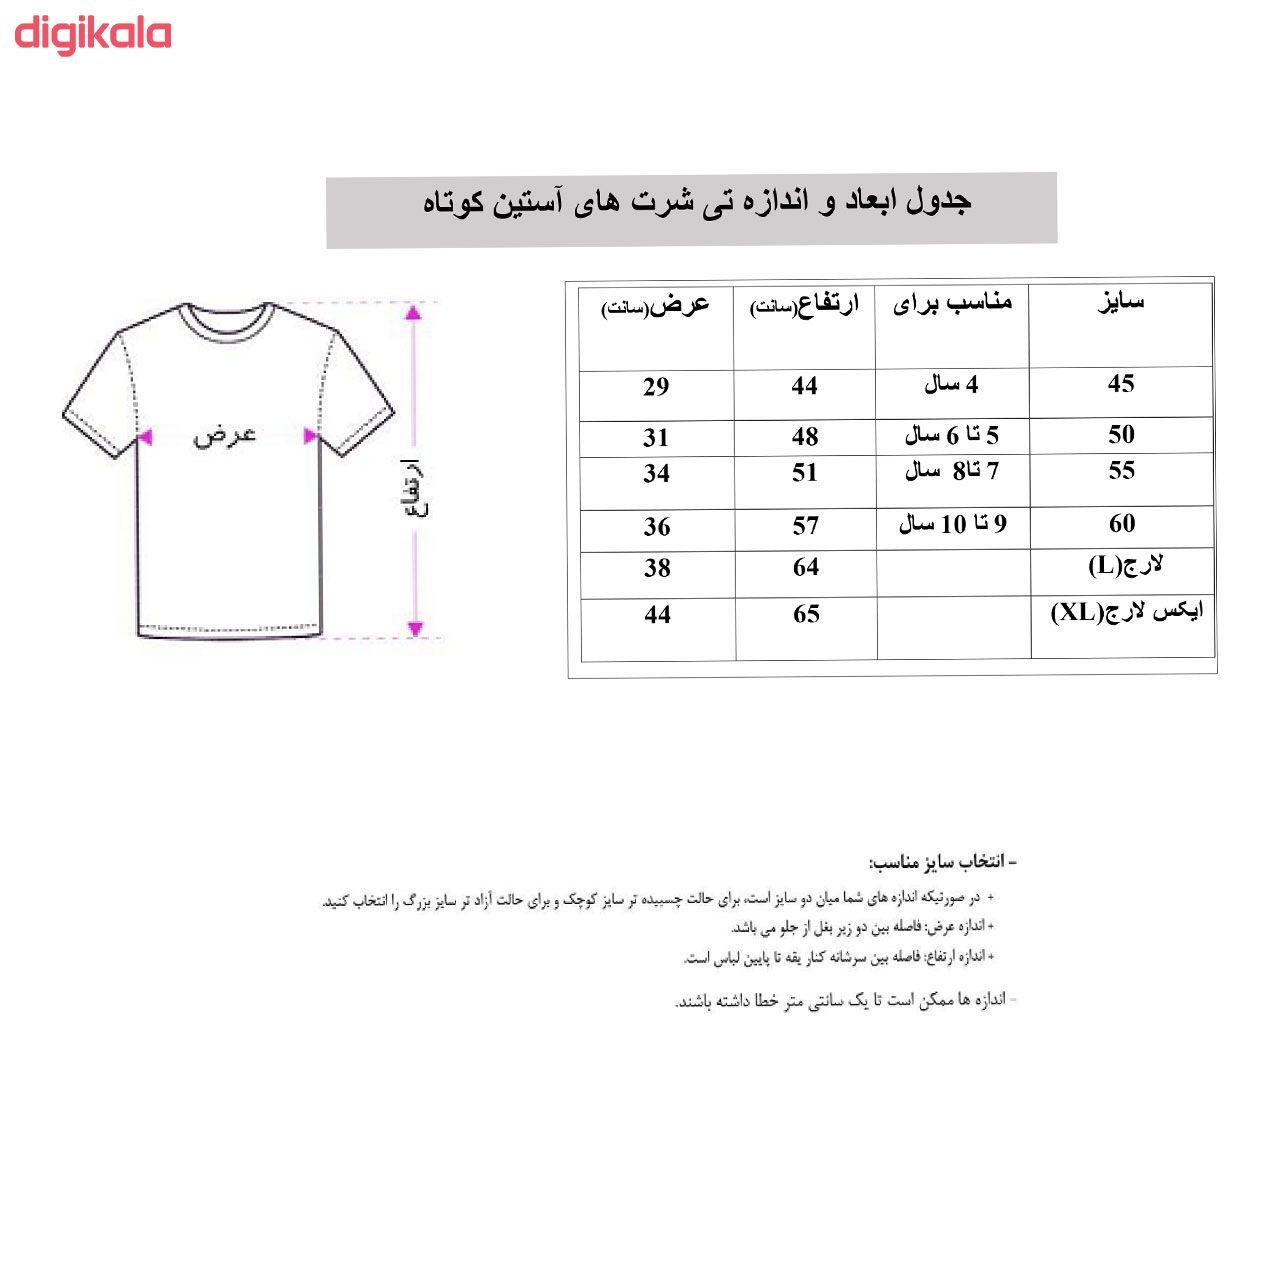 تی شرت پسرانه طرح گرگ کد 21 main 1 3